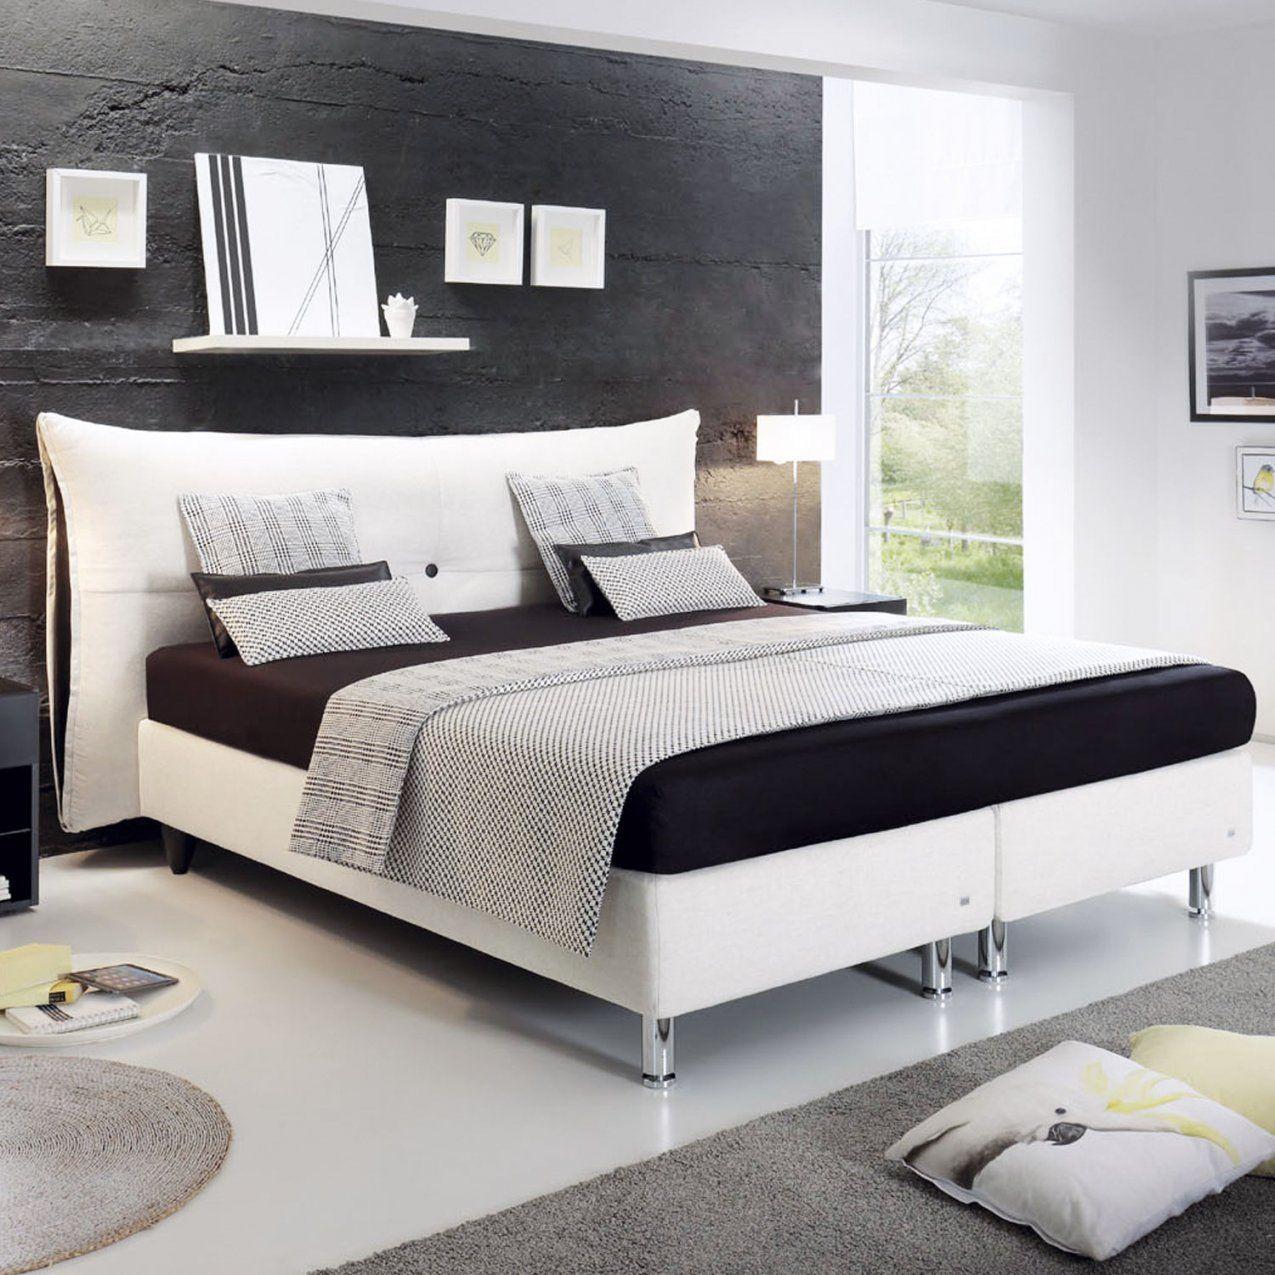 segm ller boxspringbetten preise haus design ideen. Black Bedroom Furniture Sets. Home Design Ideas